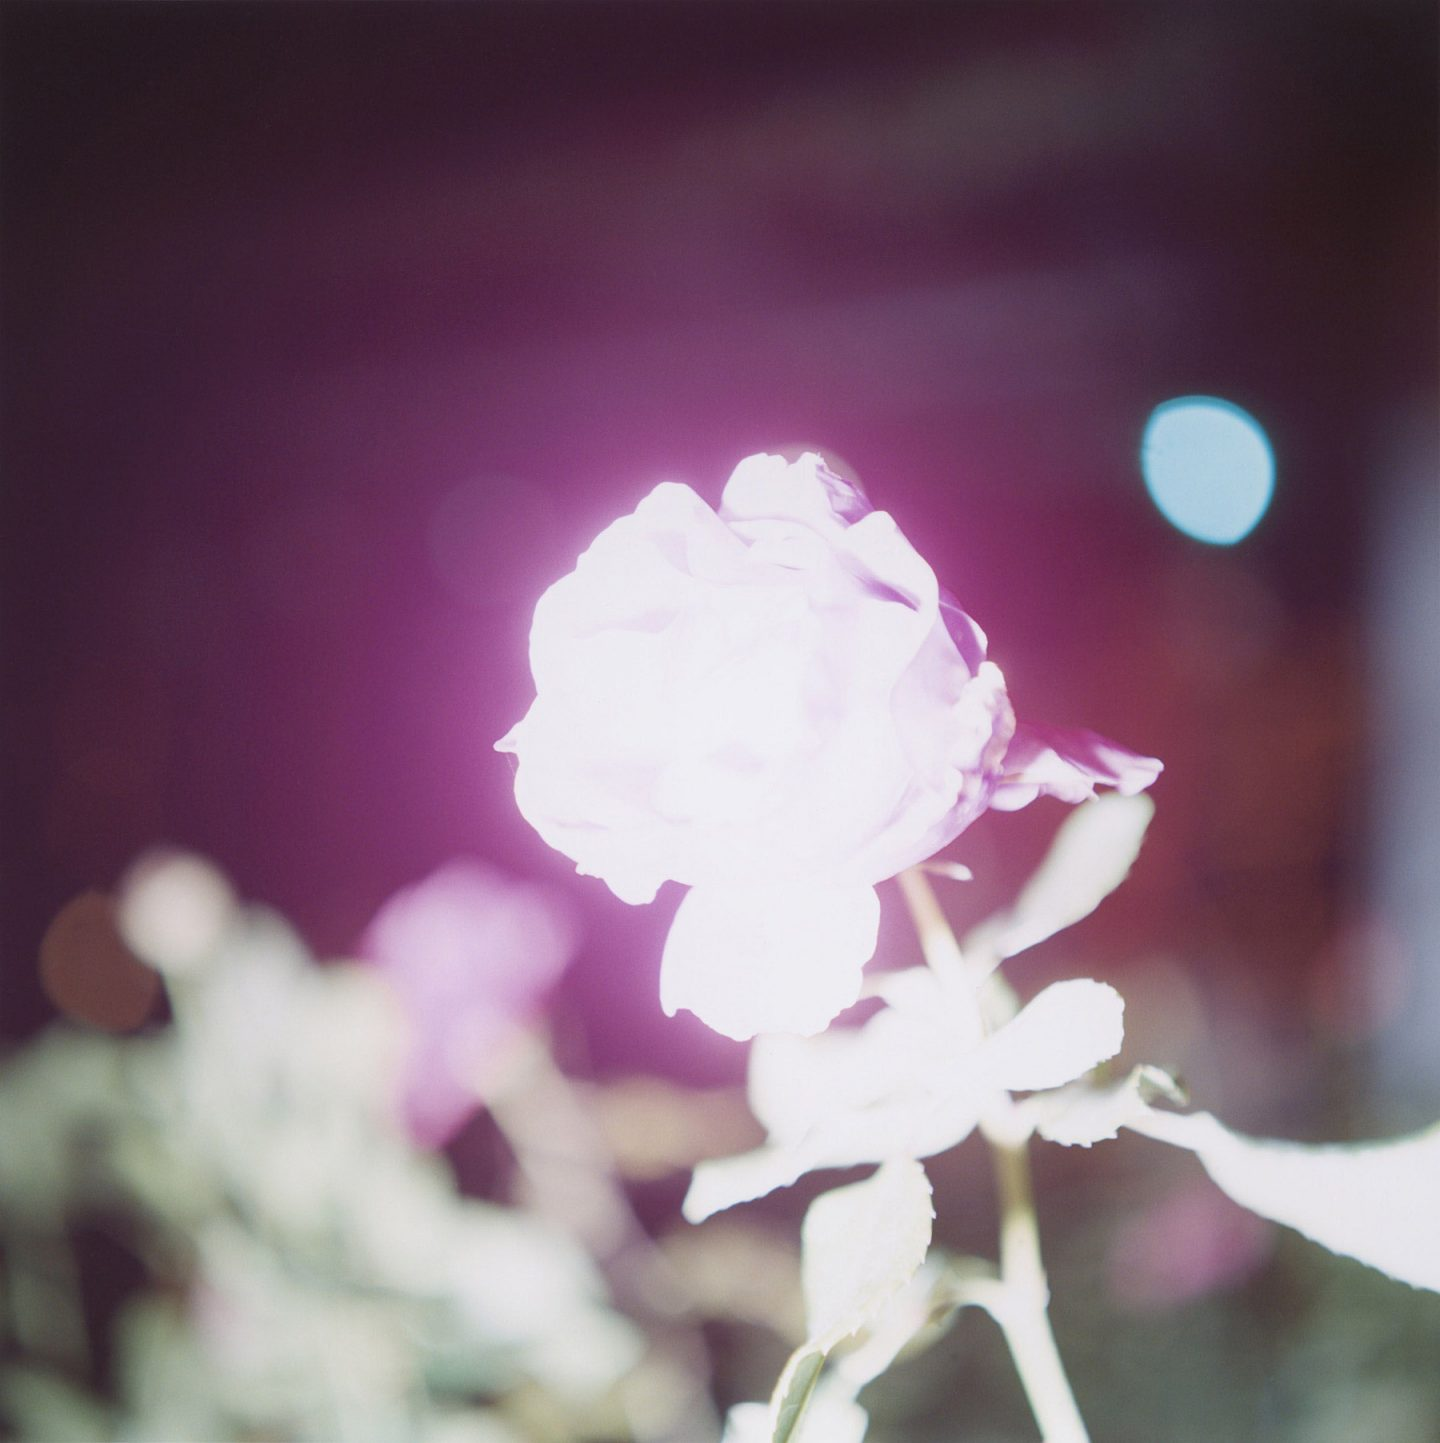 iGNANT-Photograophy-Rinko-Kawauchi-18